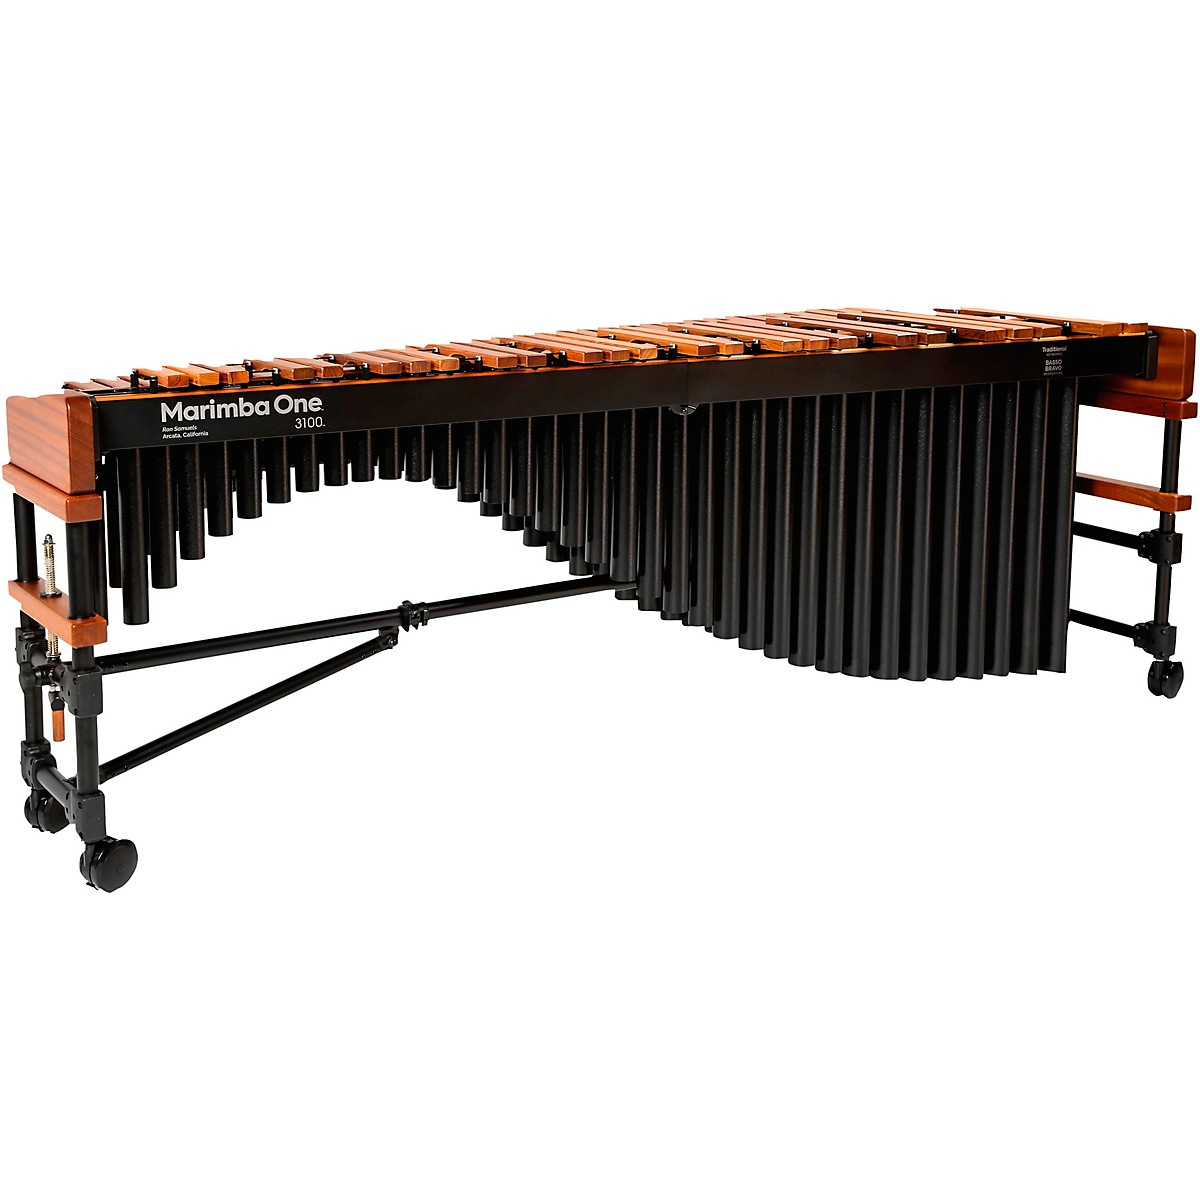 Marimba One 3100 #9304 A442 Marimba with Traditional Keyboard and Basso Bravo Resonators